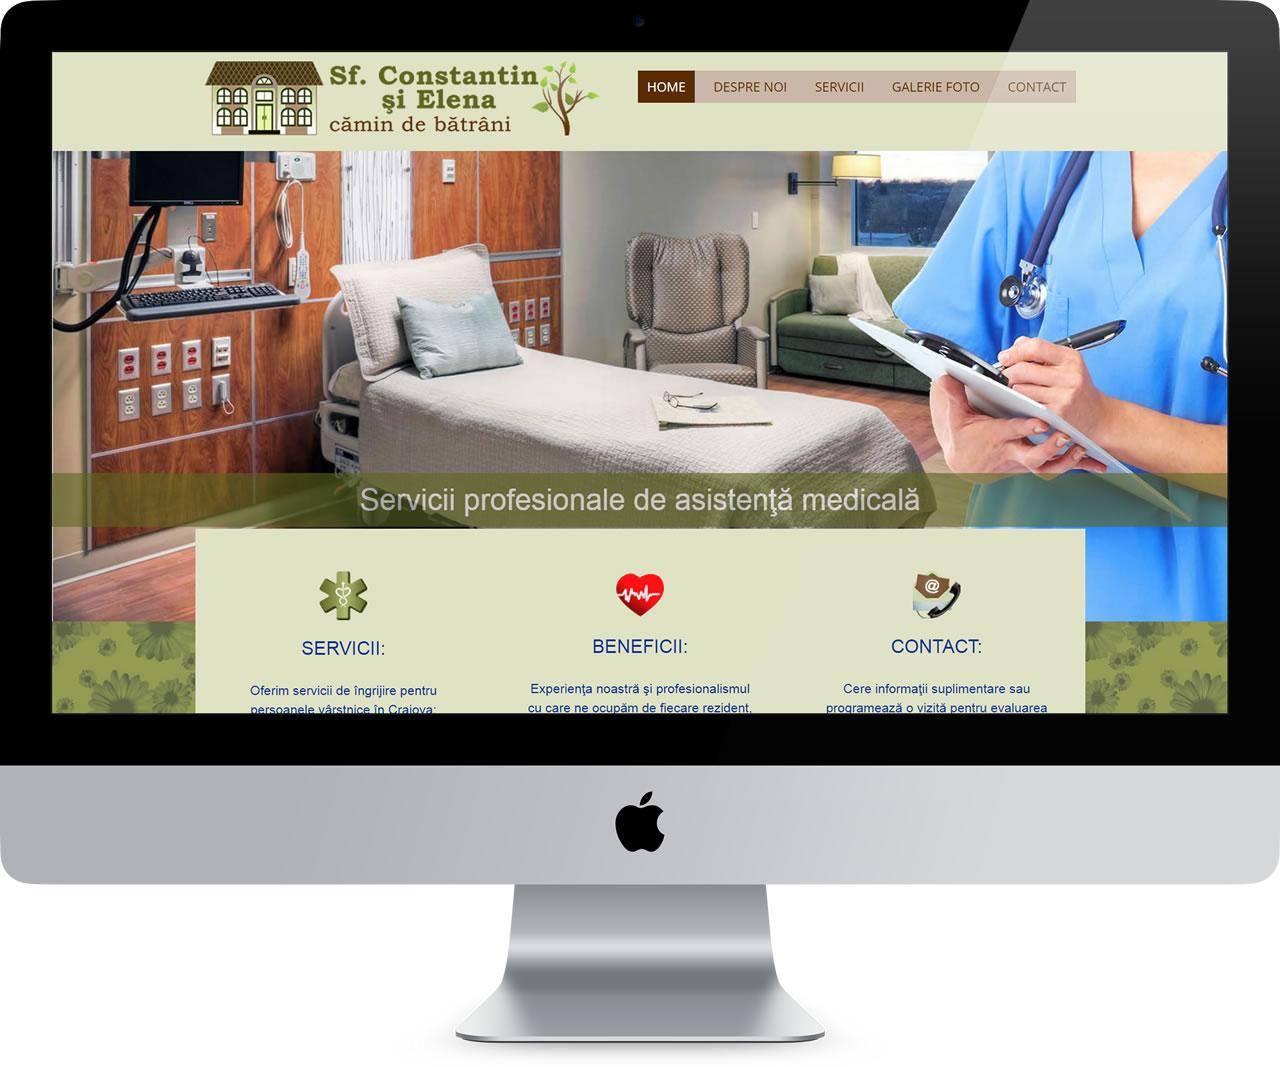 website 059 responsive caminul batrani sfintii constantin si elena